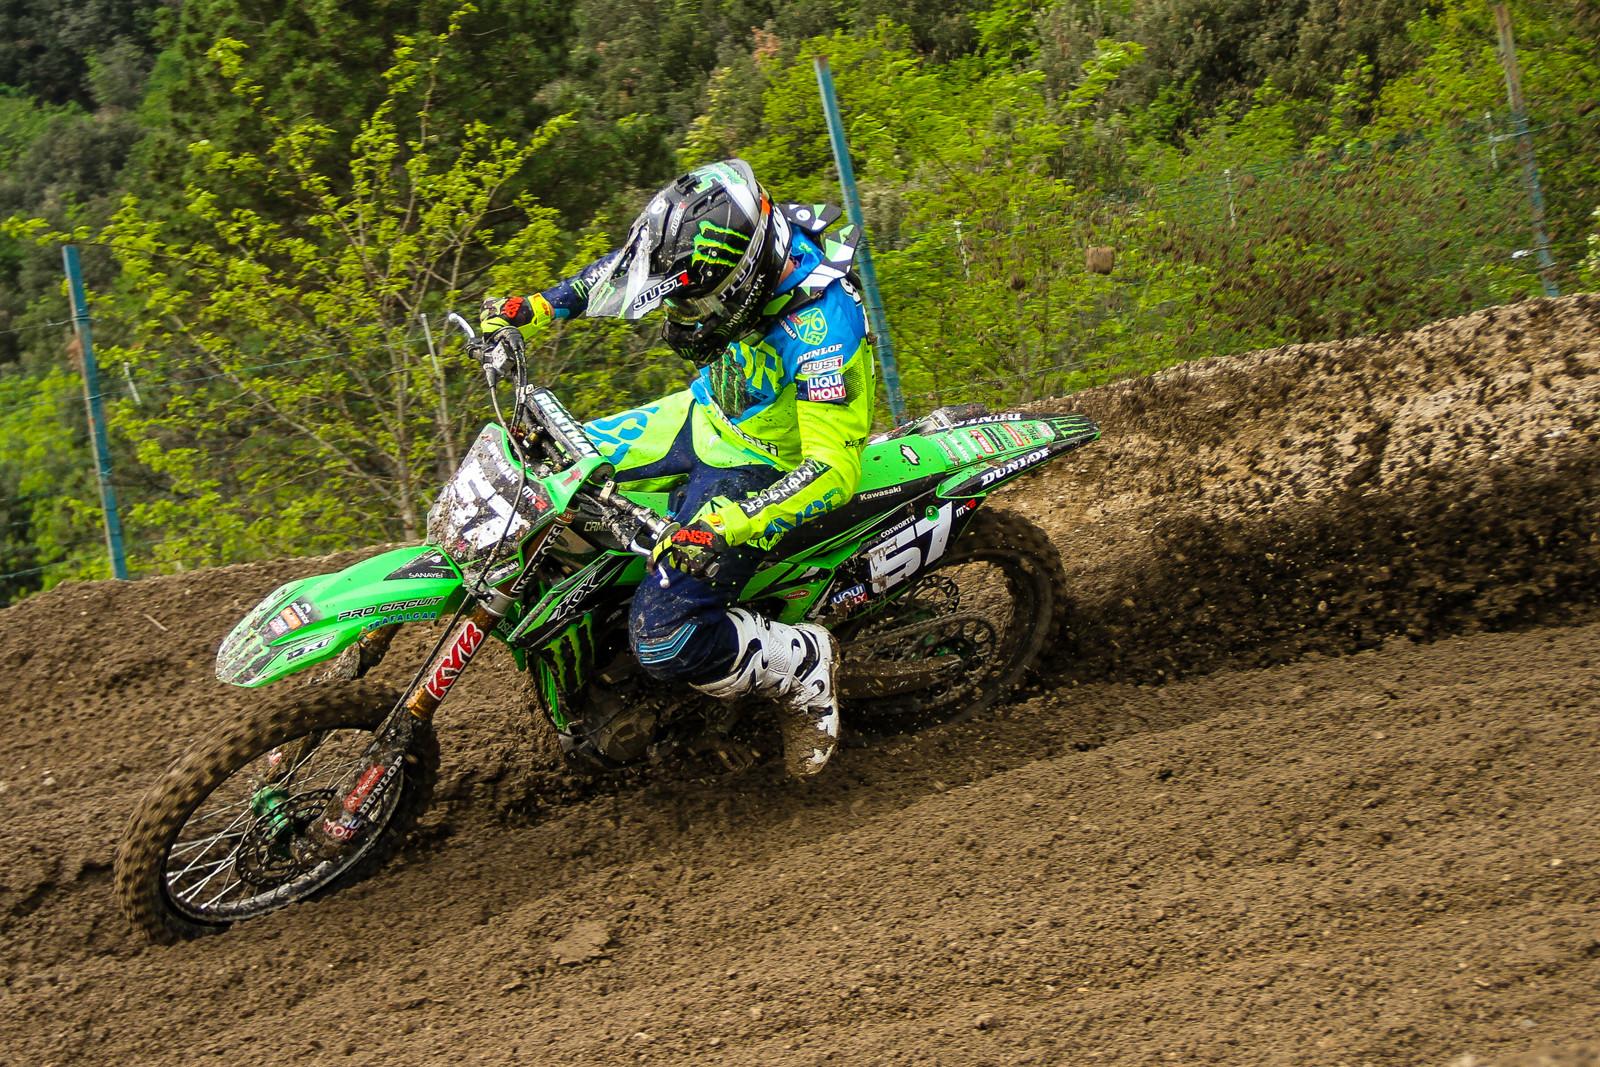 Darian Sanayei - Photo Blast: 2017 MXGP of Trentino - Motocross Pictures - Vital MX